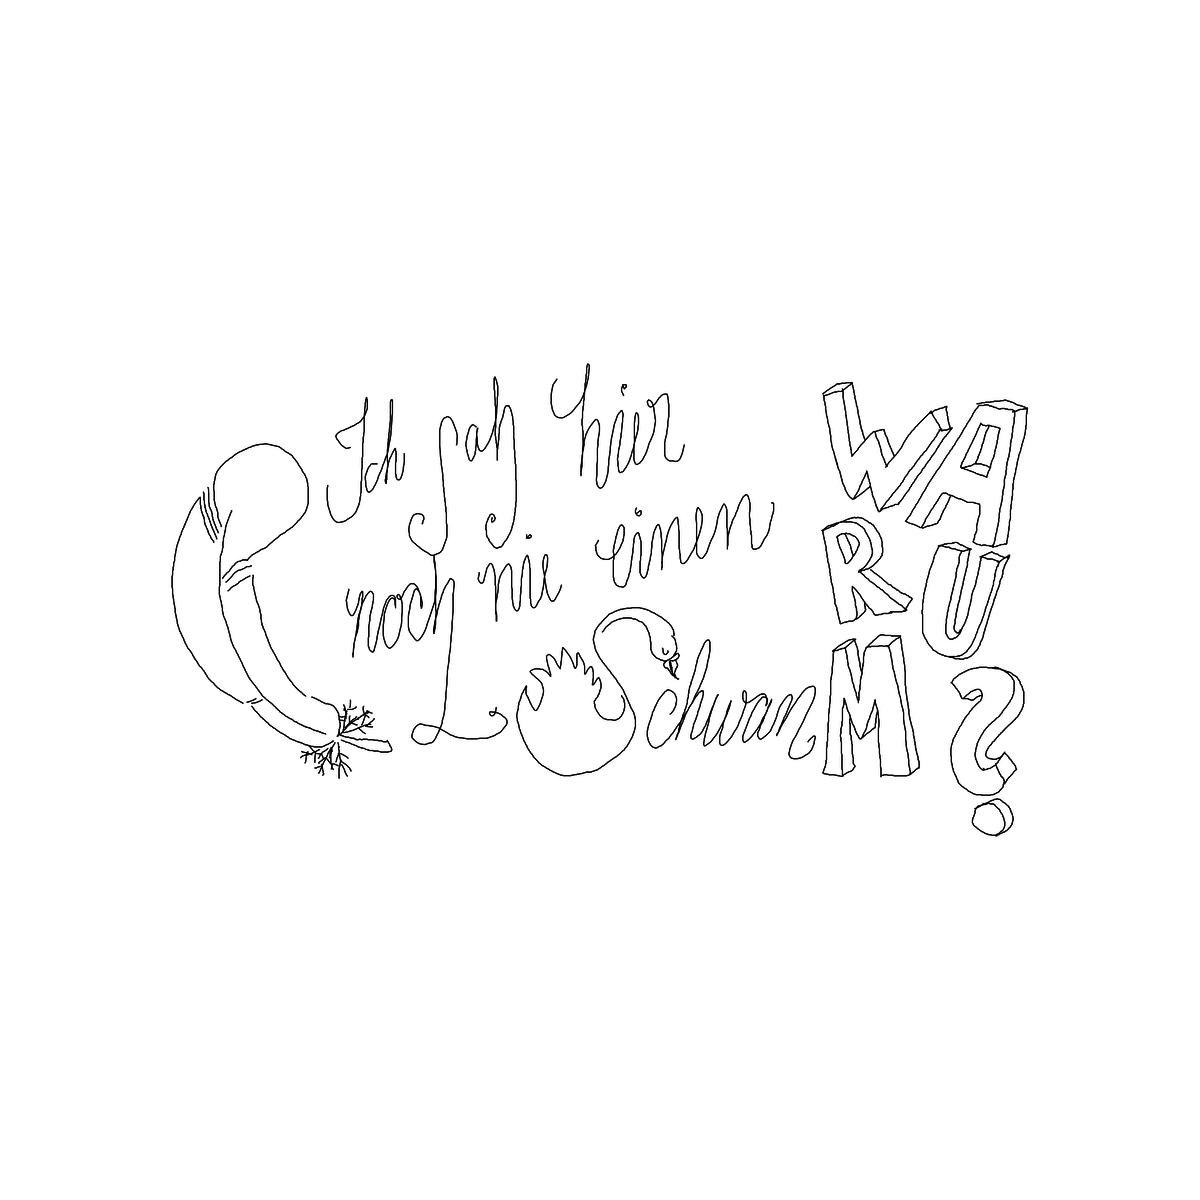 BAAAM drawing#20470 lat:53.6099090576171900lng: 9.8226718902587890